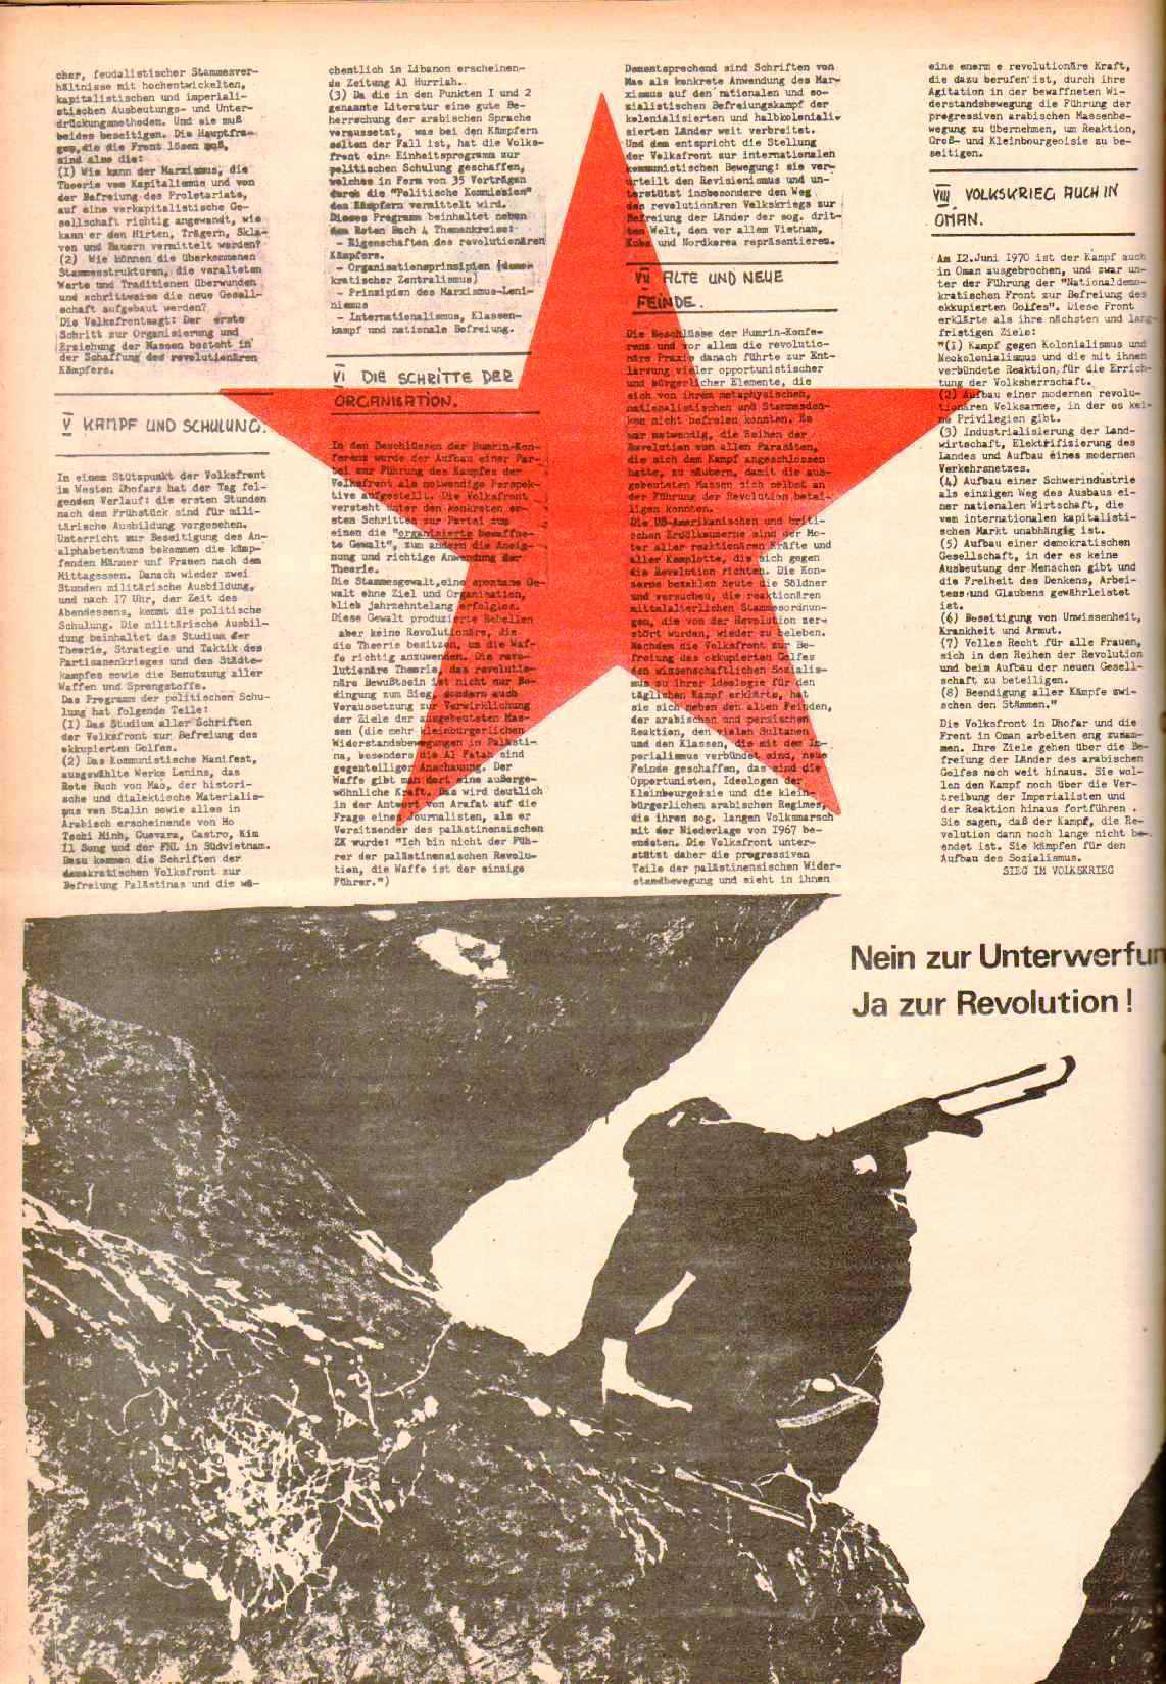 Berlin_Hochschulkampf_1971_08_14